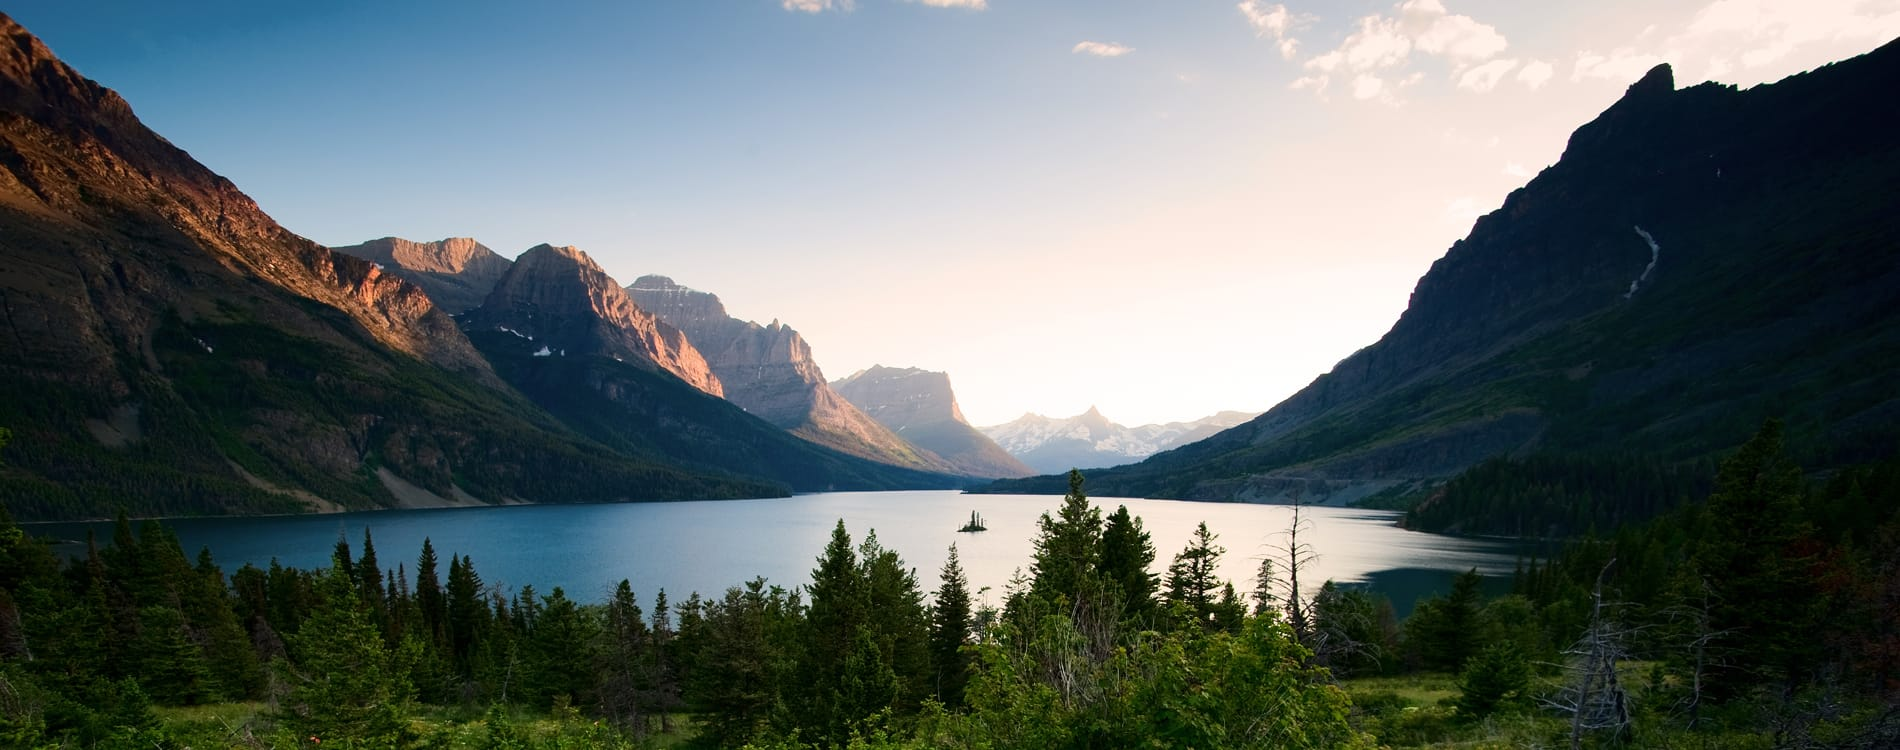 Glacier National Park - Wild Goose Island Saint Mary Lake